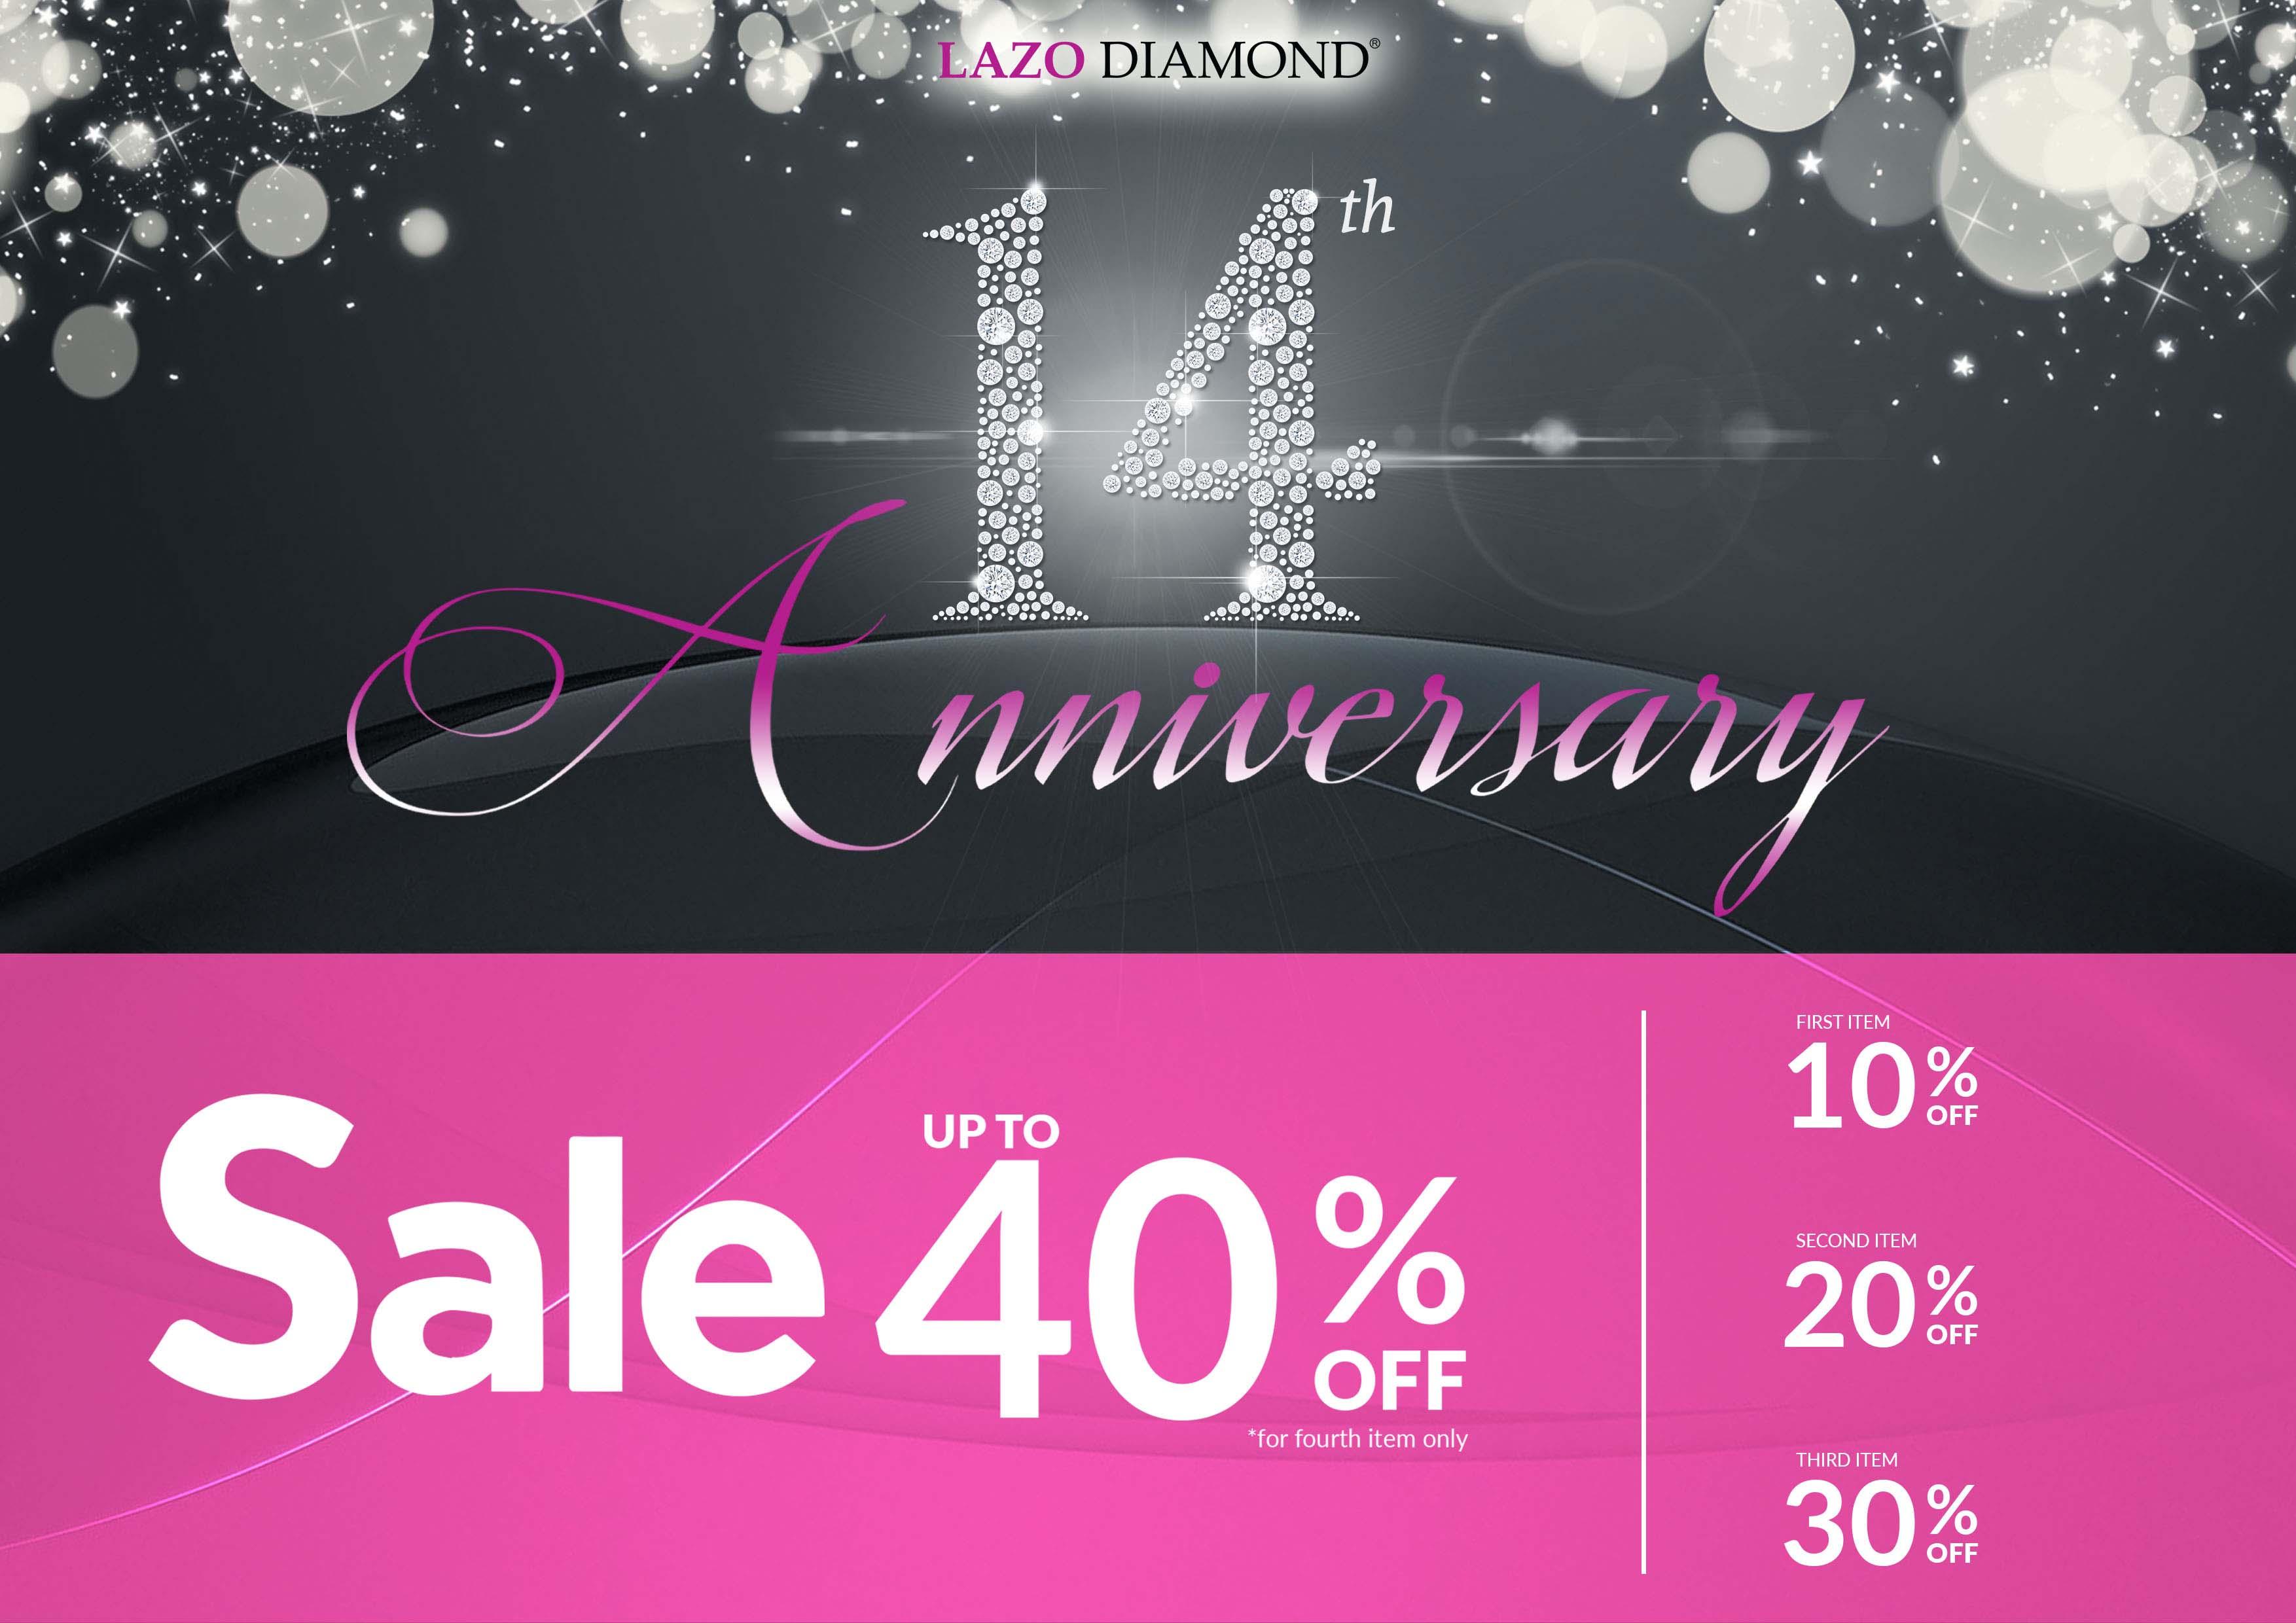 Lazo Diamond 14th Anniversary